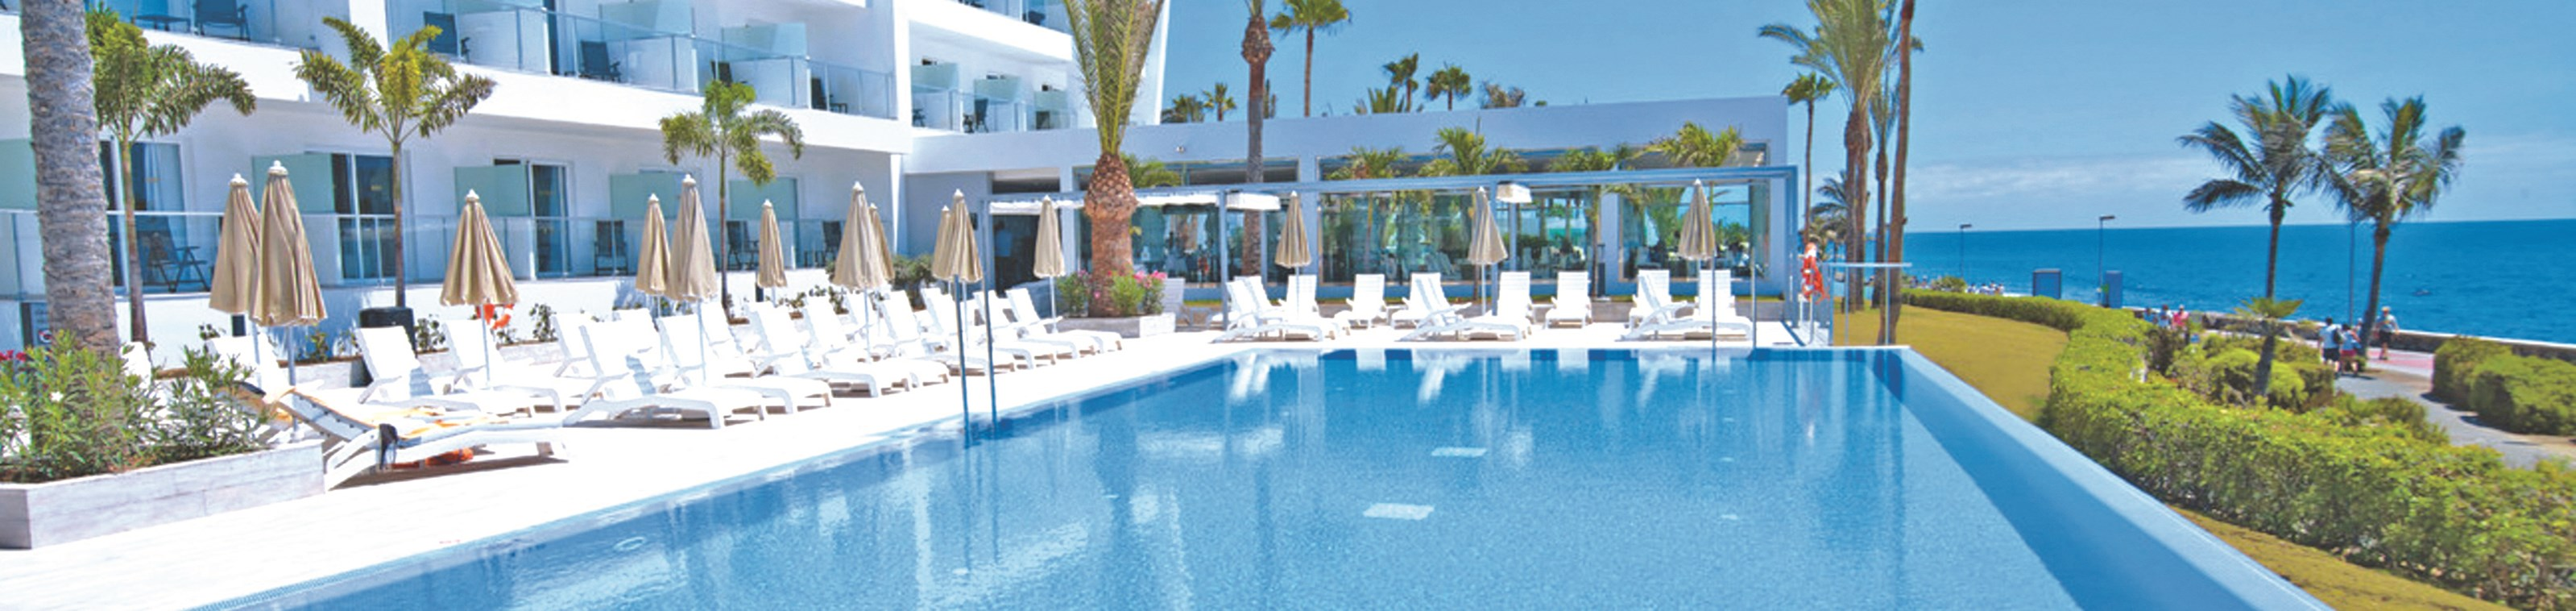 Vijfsterrenhotel Riu Palace Meloneras op Gran Canaria